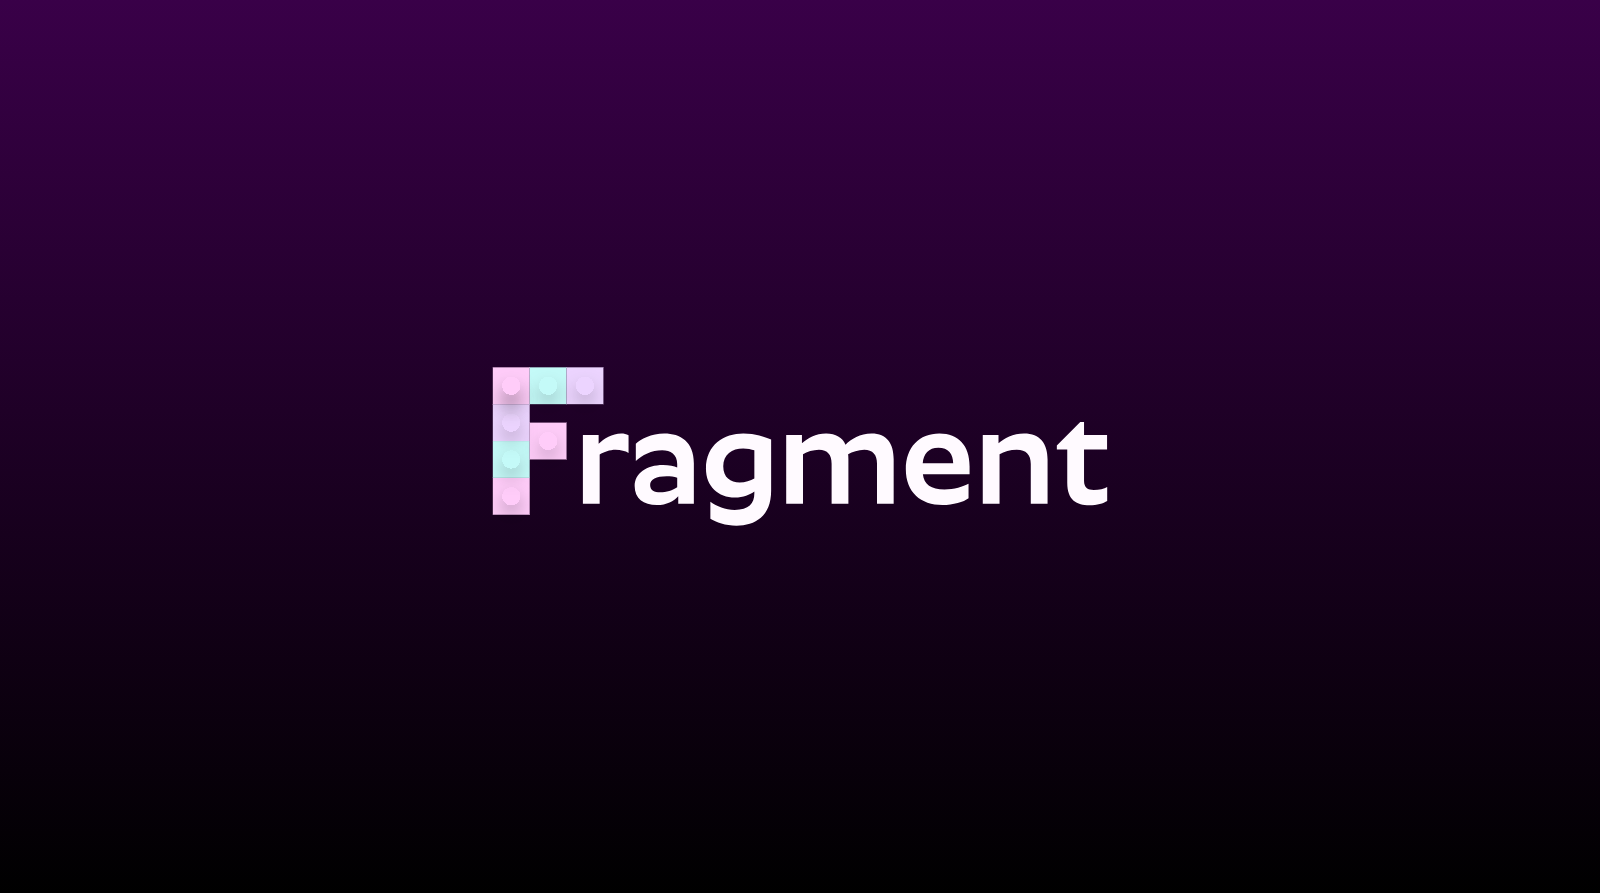 Fragment showcase